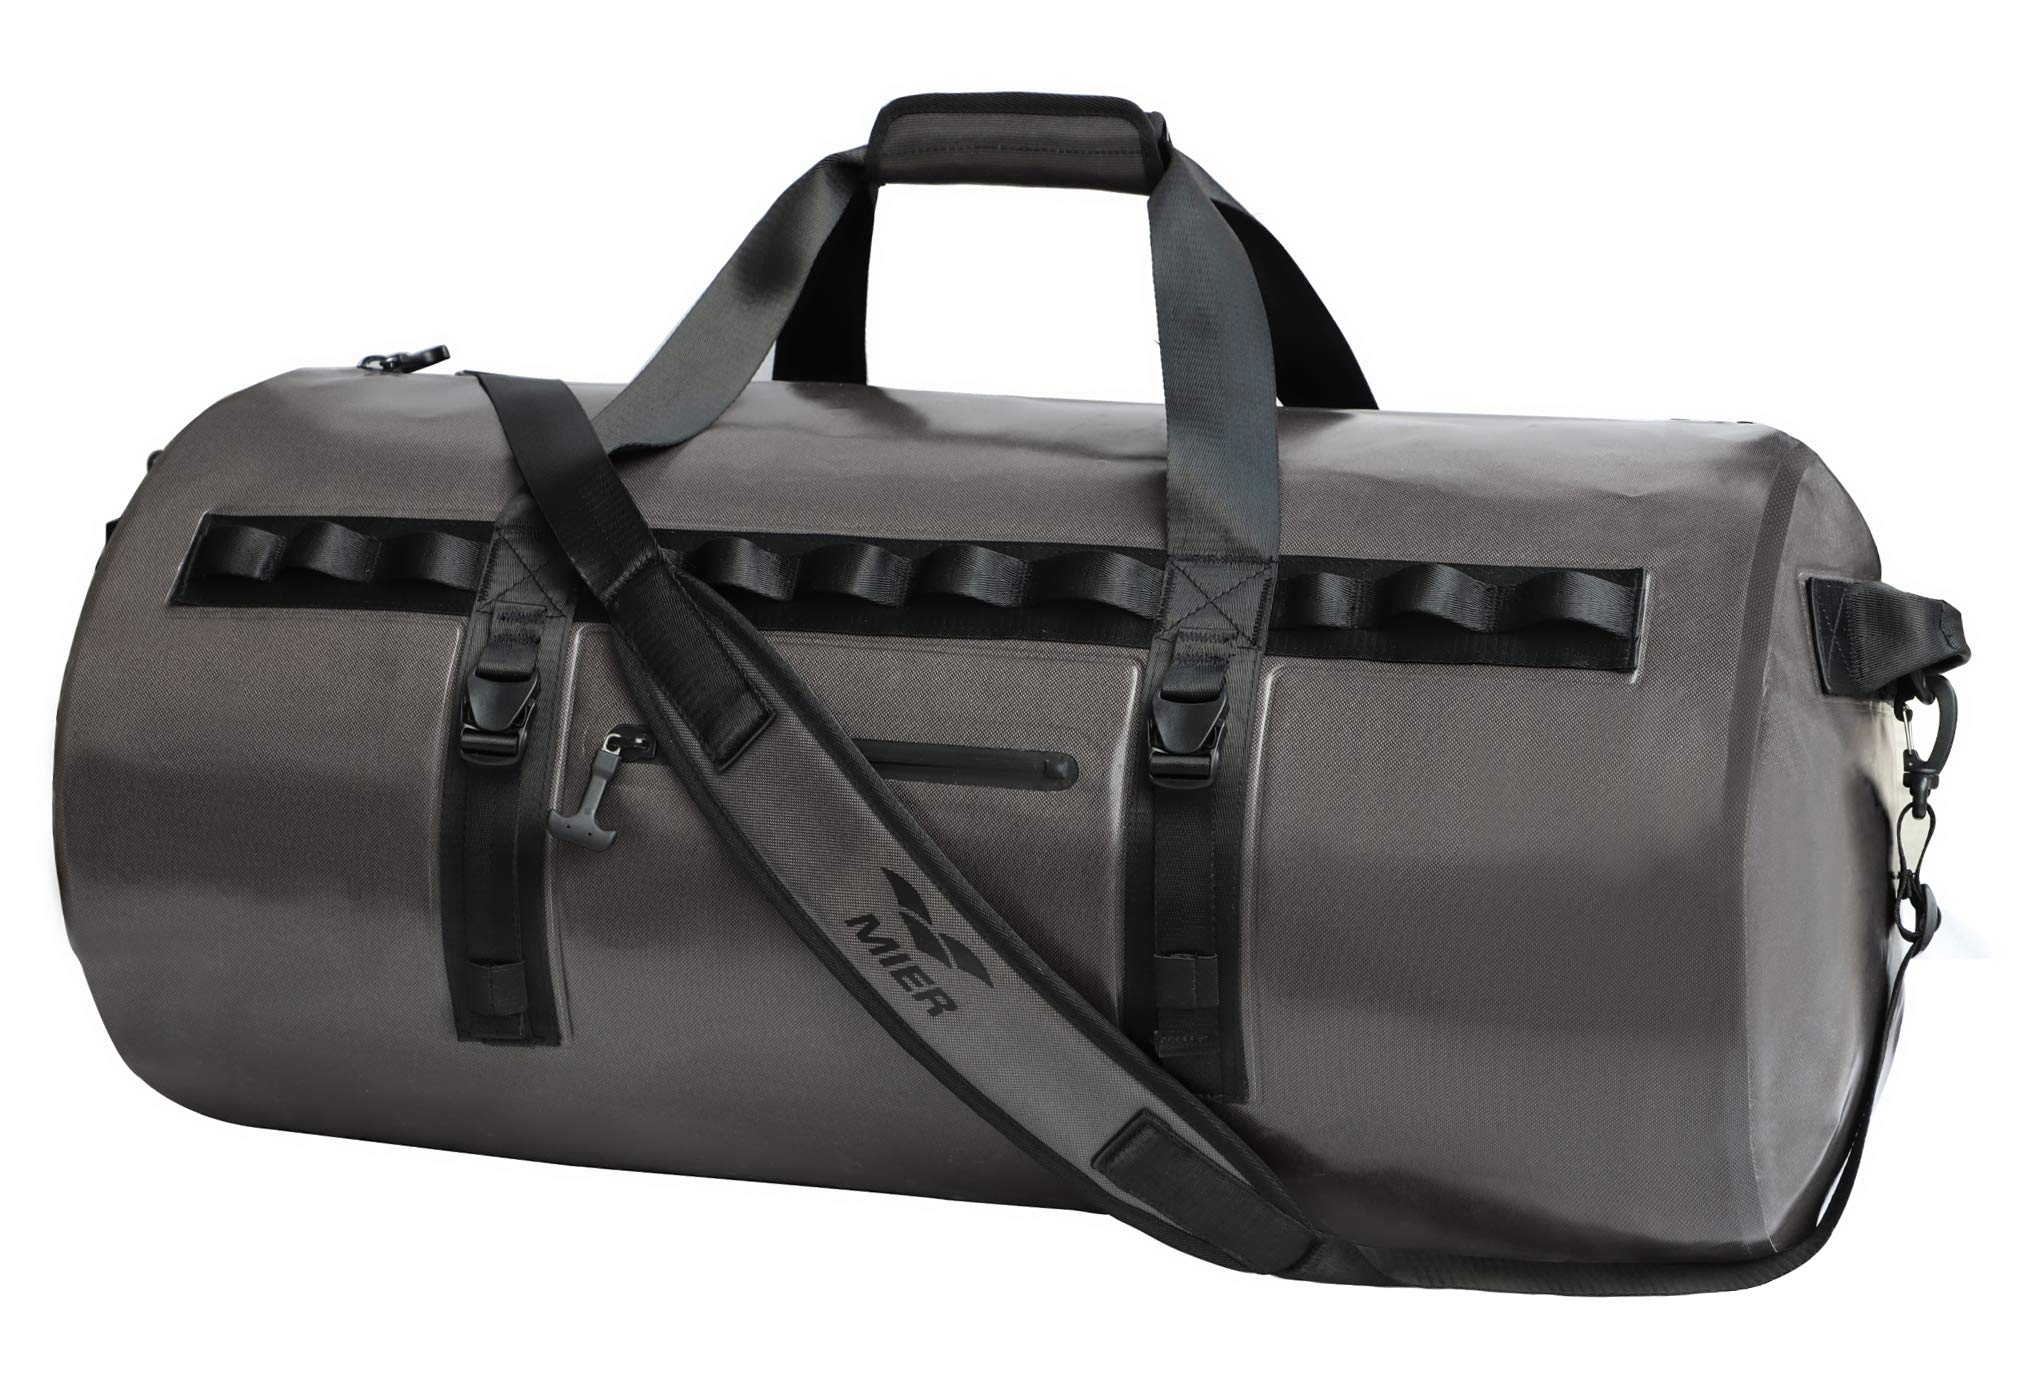 MIER Waterproof Dry Duffel Bag Airtight TPU Dry Bag for Motorcycle, Kayaking, Rafting, Skiing, Travel, Hiking, Camping, 70L/90L, Dark Grey